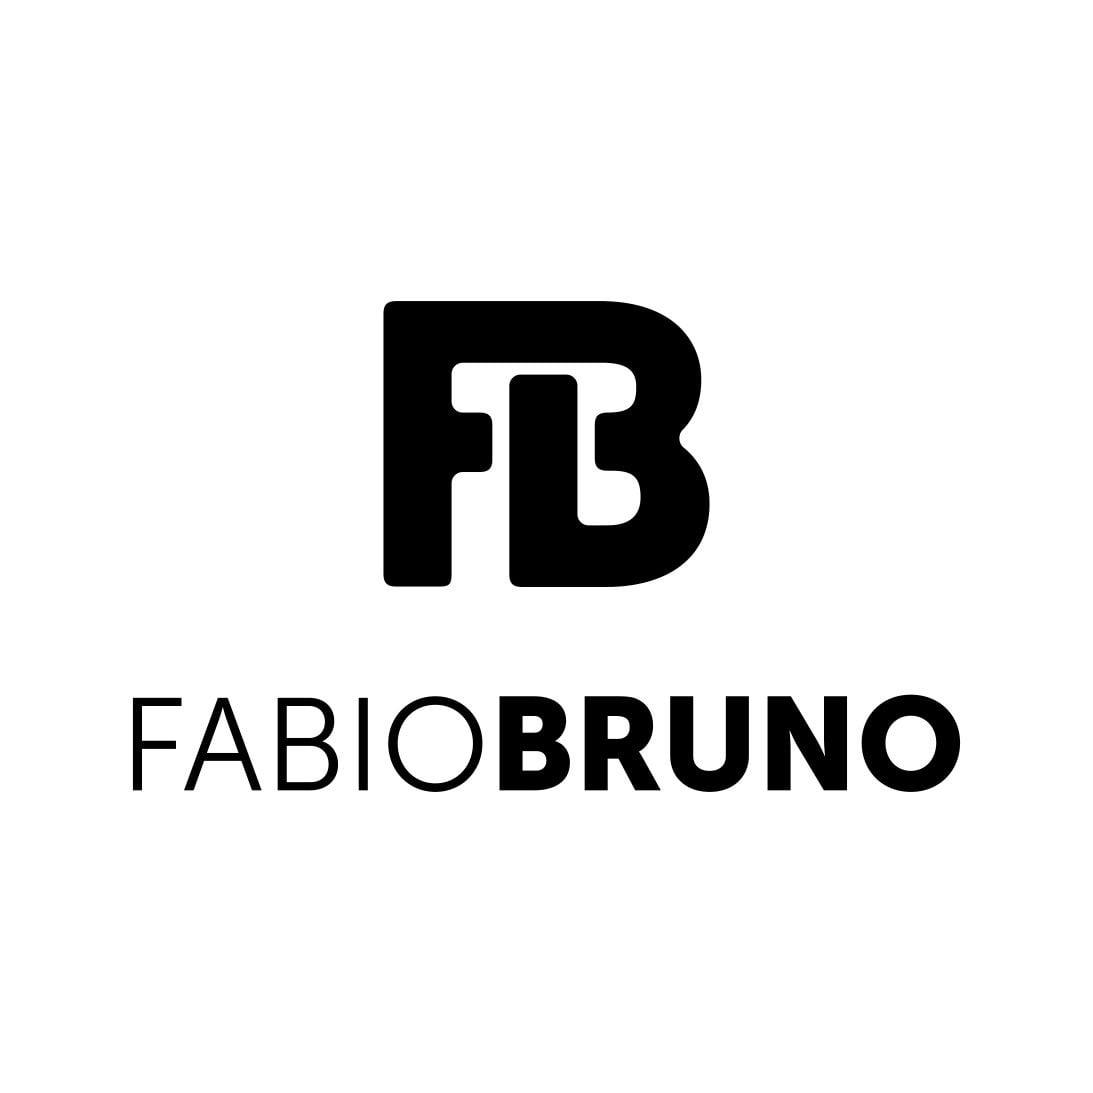 Фабиобруно